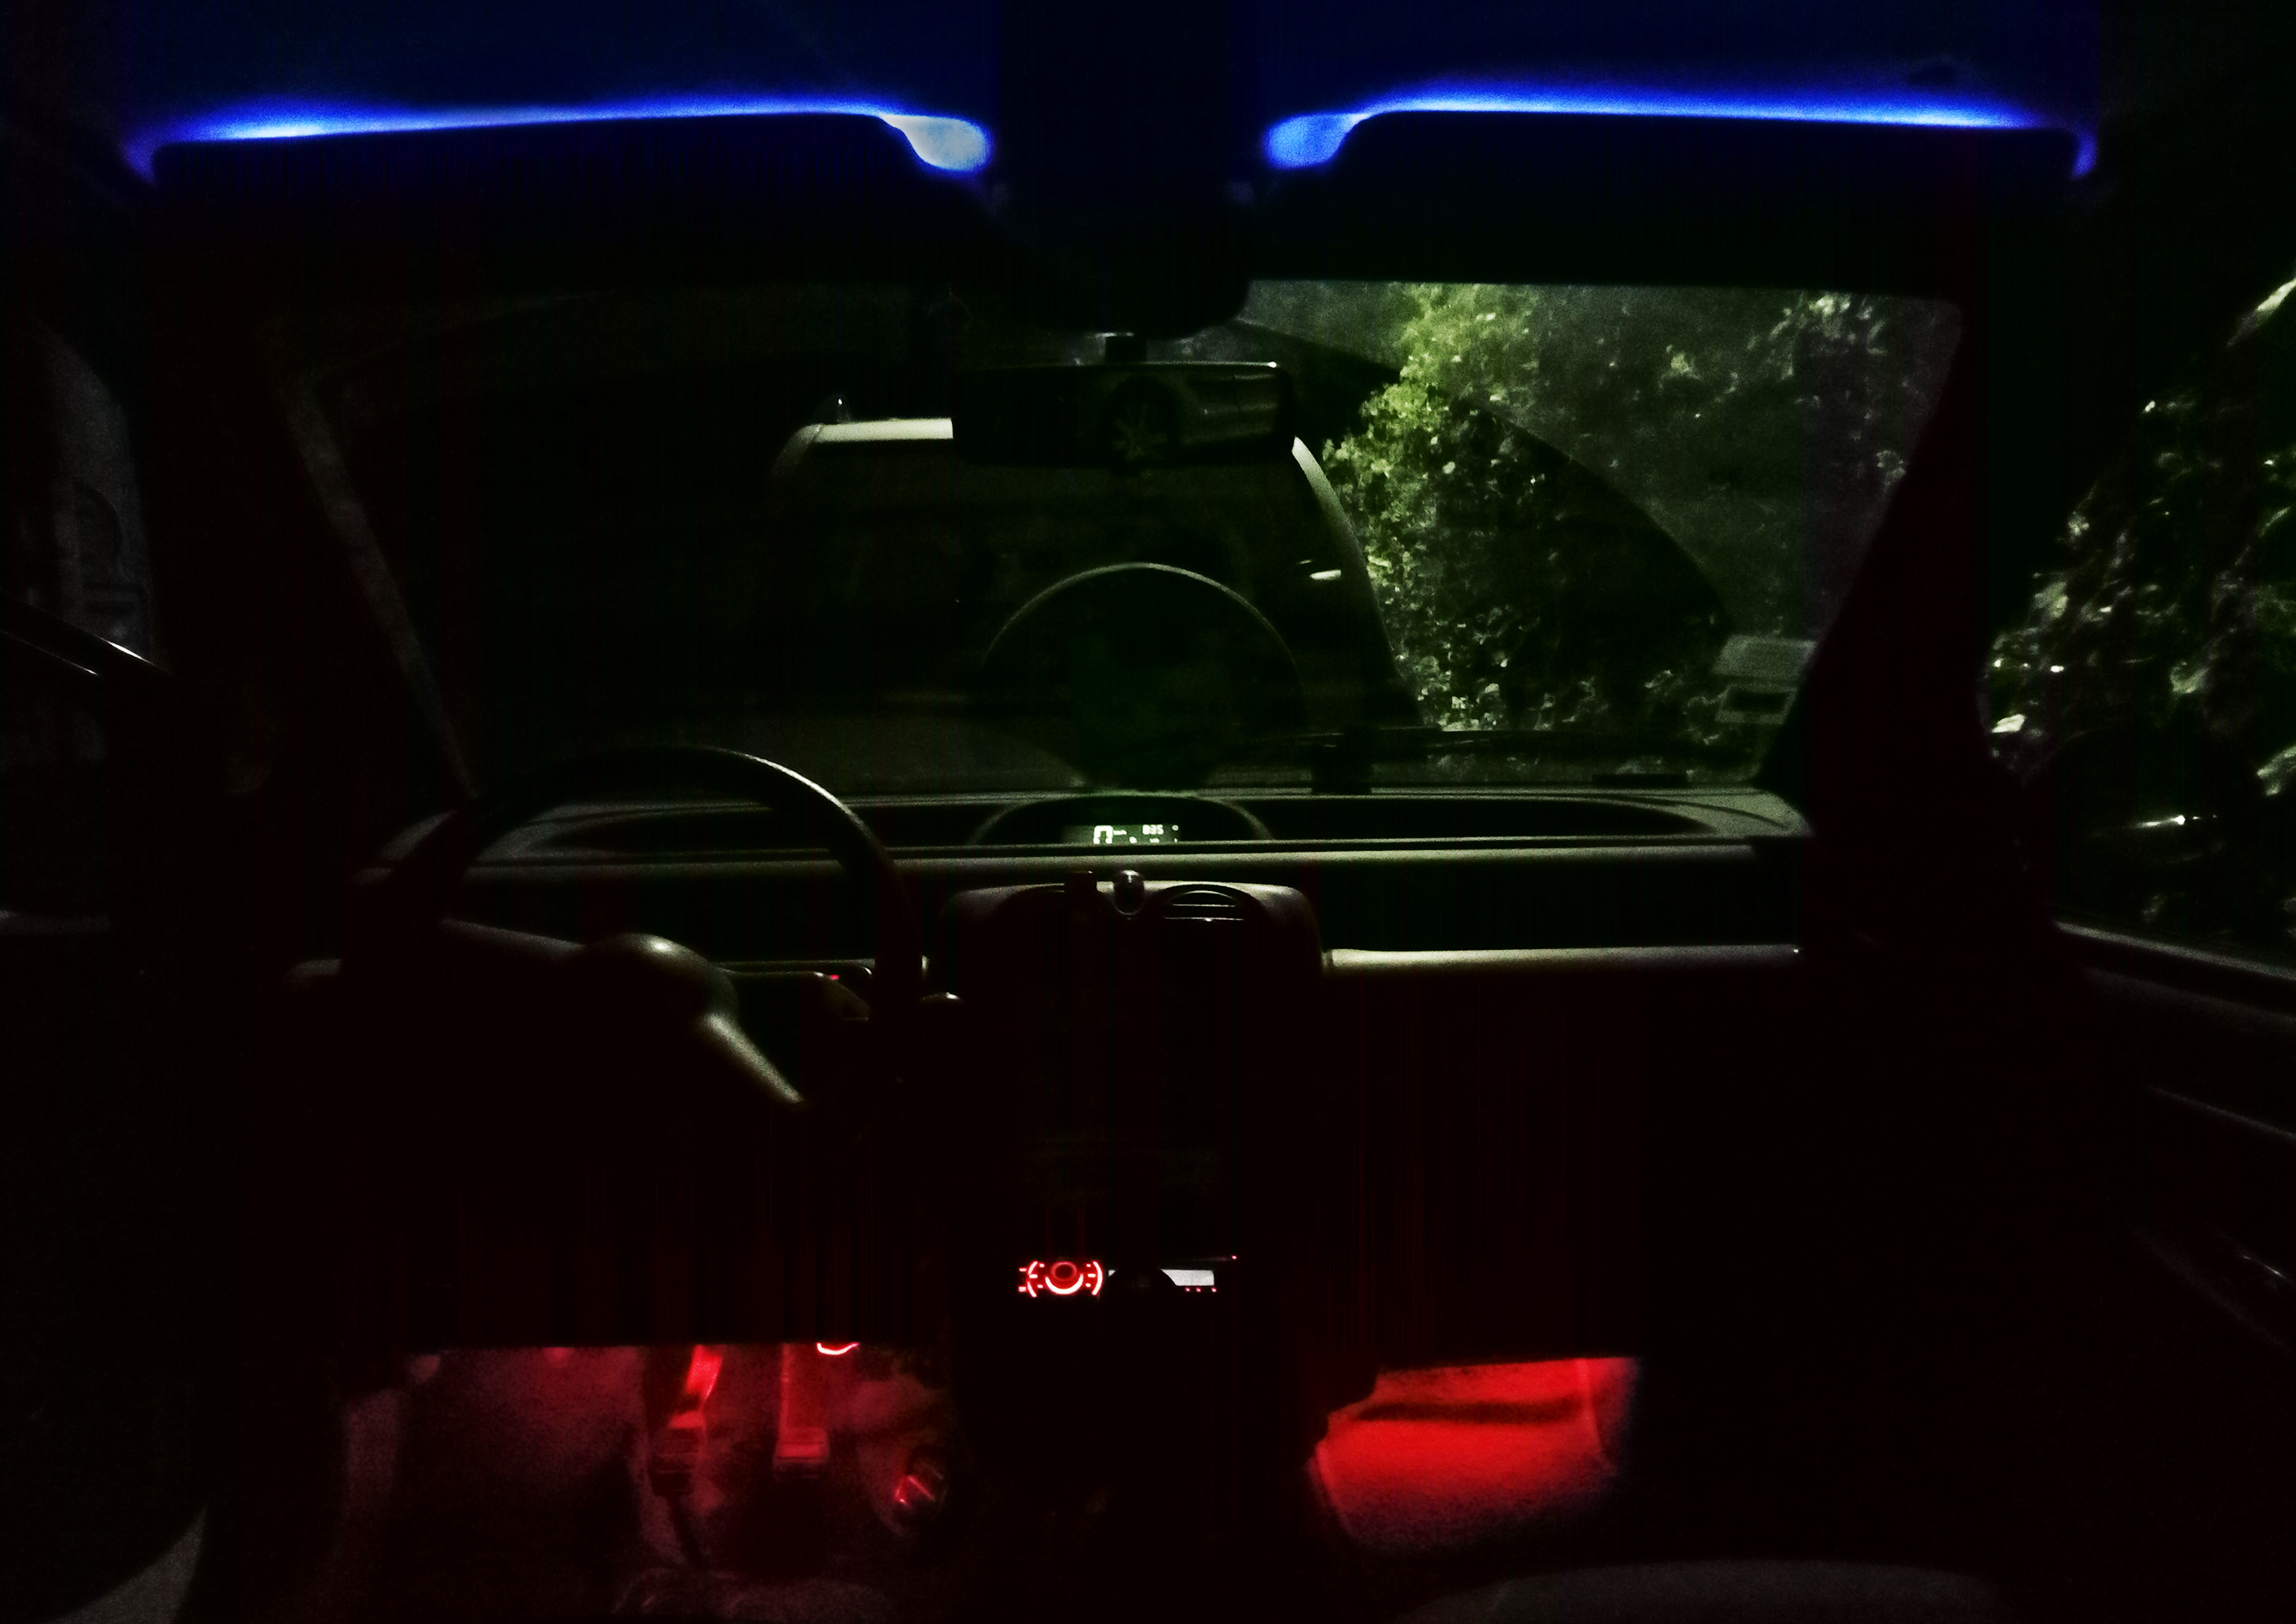 rendu de nuit intérieur